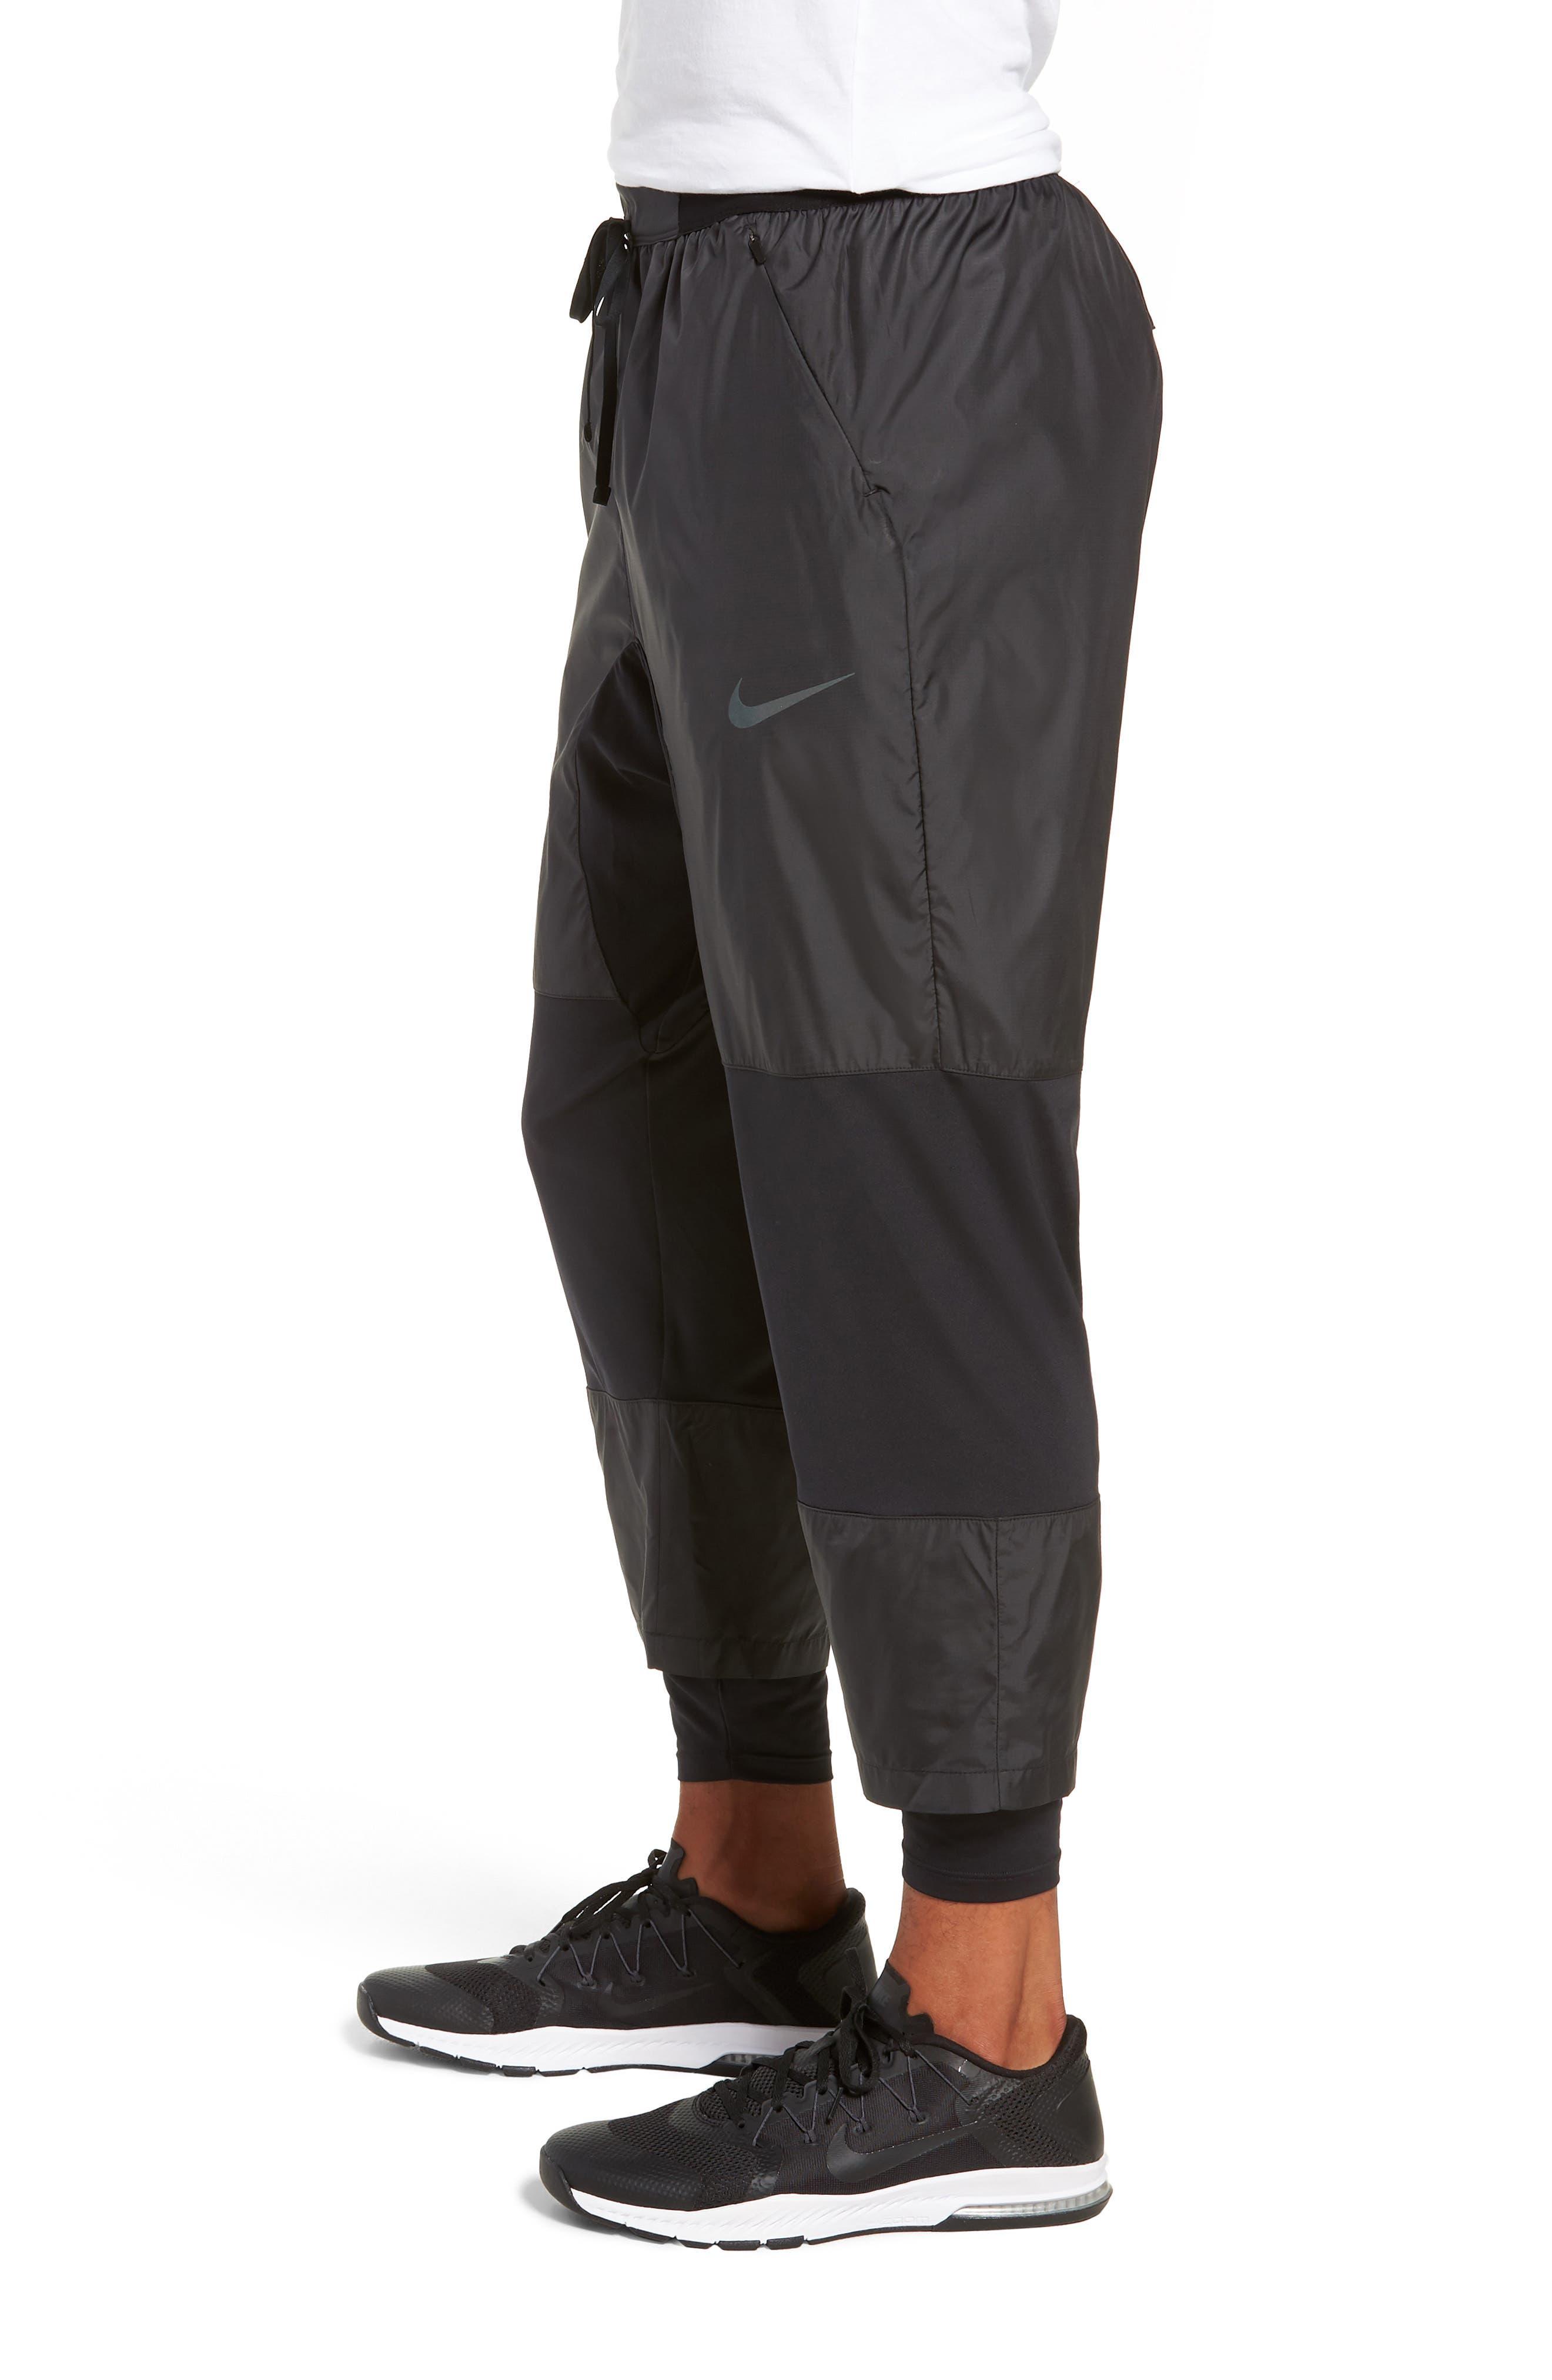 Dry Division Tech Running Pants,                             Alternate thumbnail 3, color,                             BLACK/ BLACK